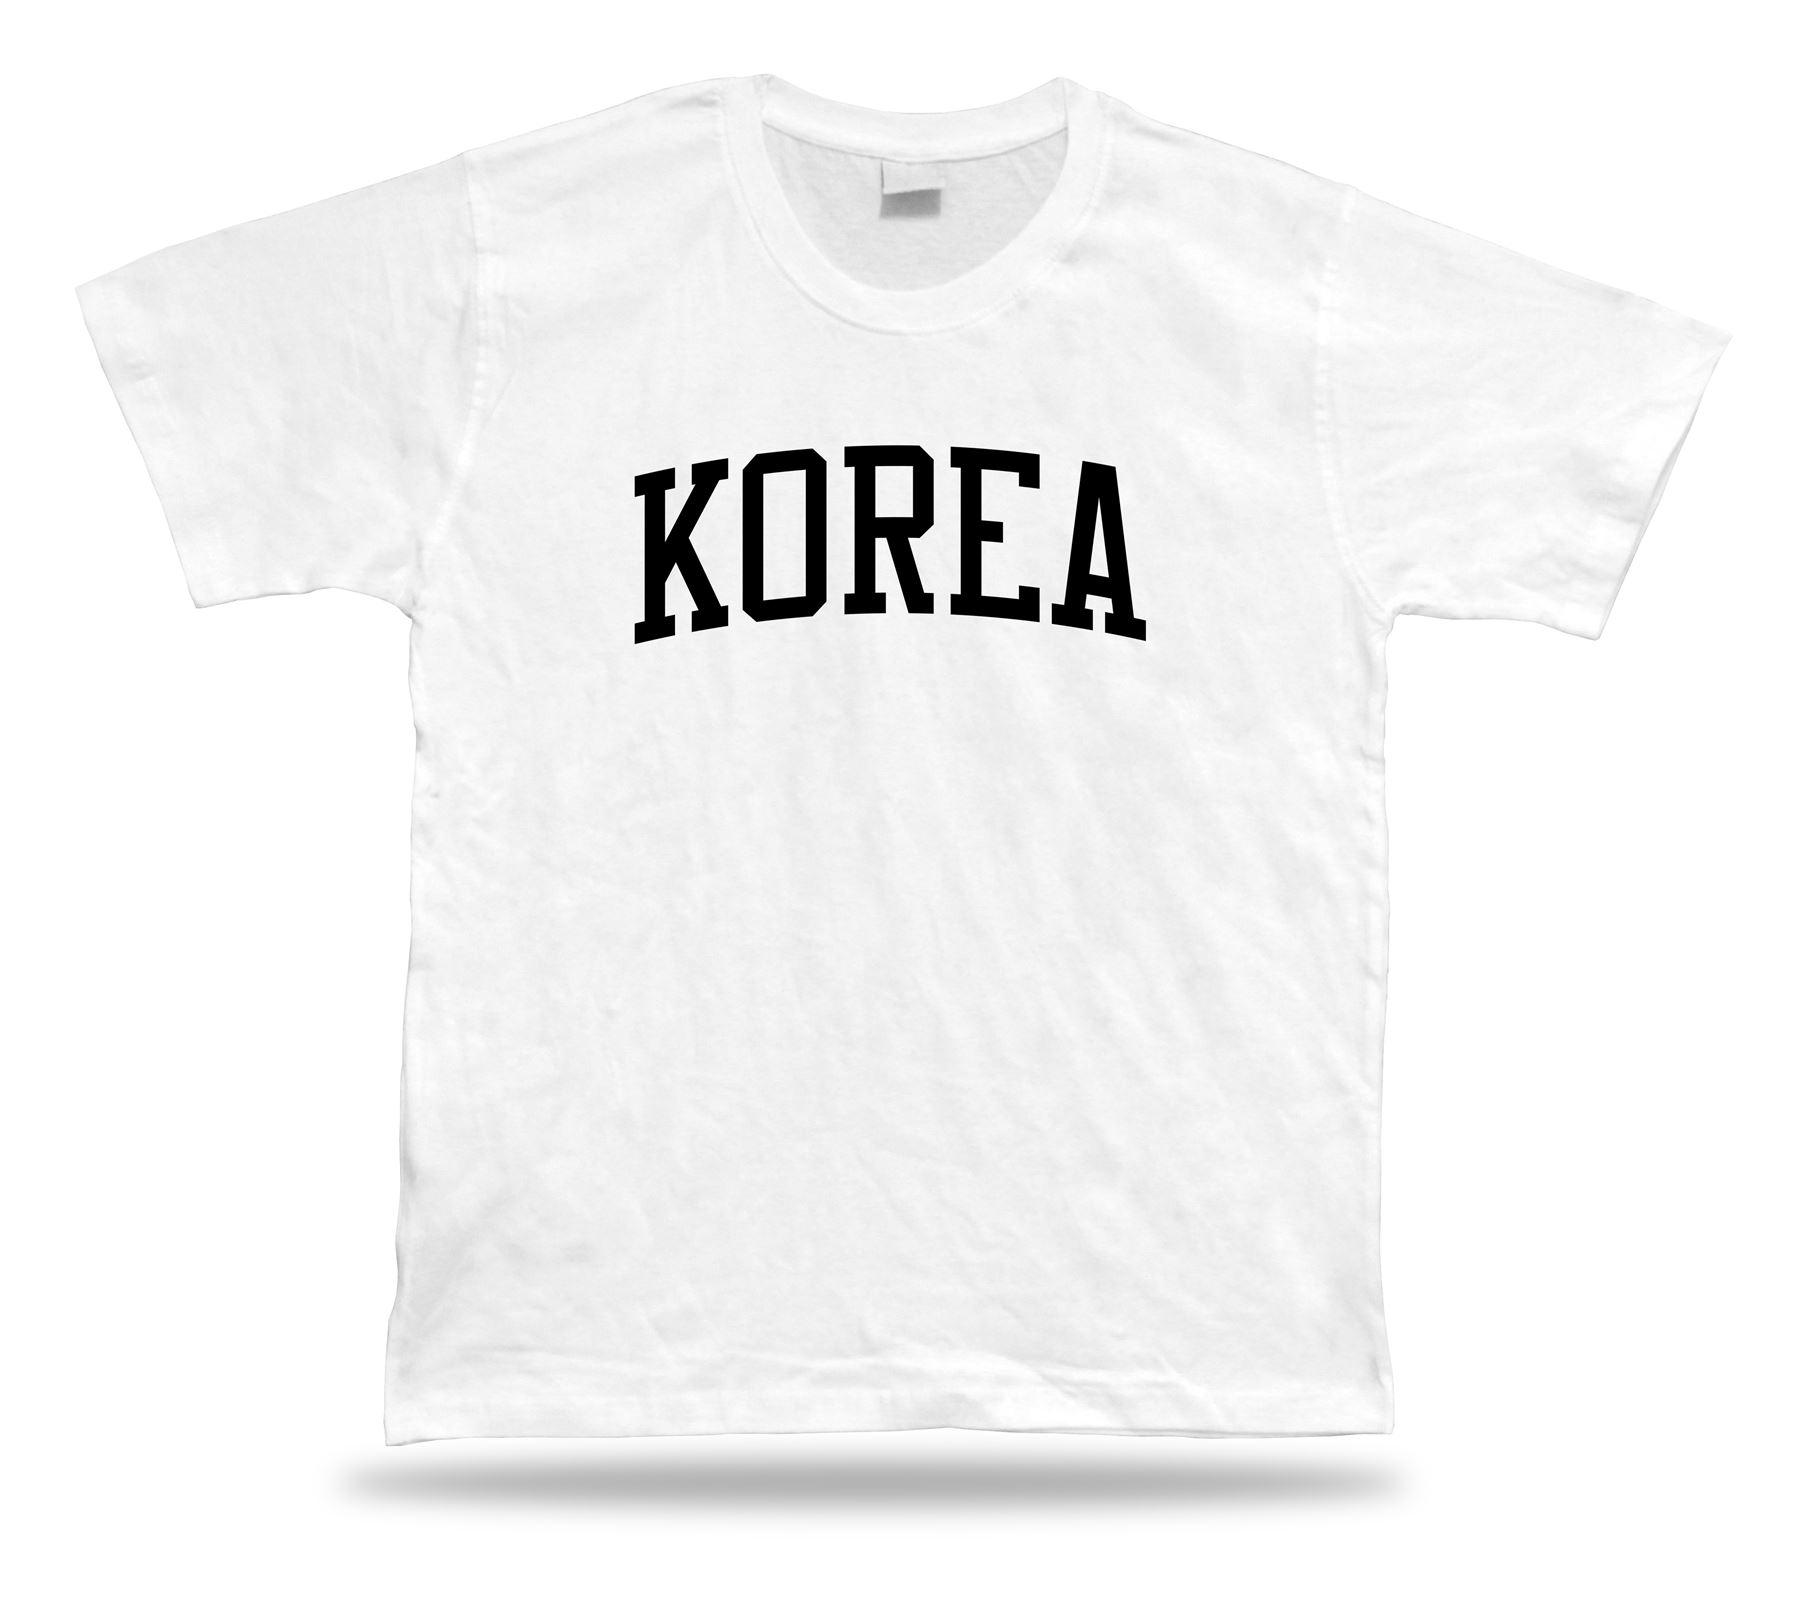 T-shirt Sylish Gift Idea Sport Short Sleave Korean Barbeque Seoul ... e299afc03